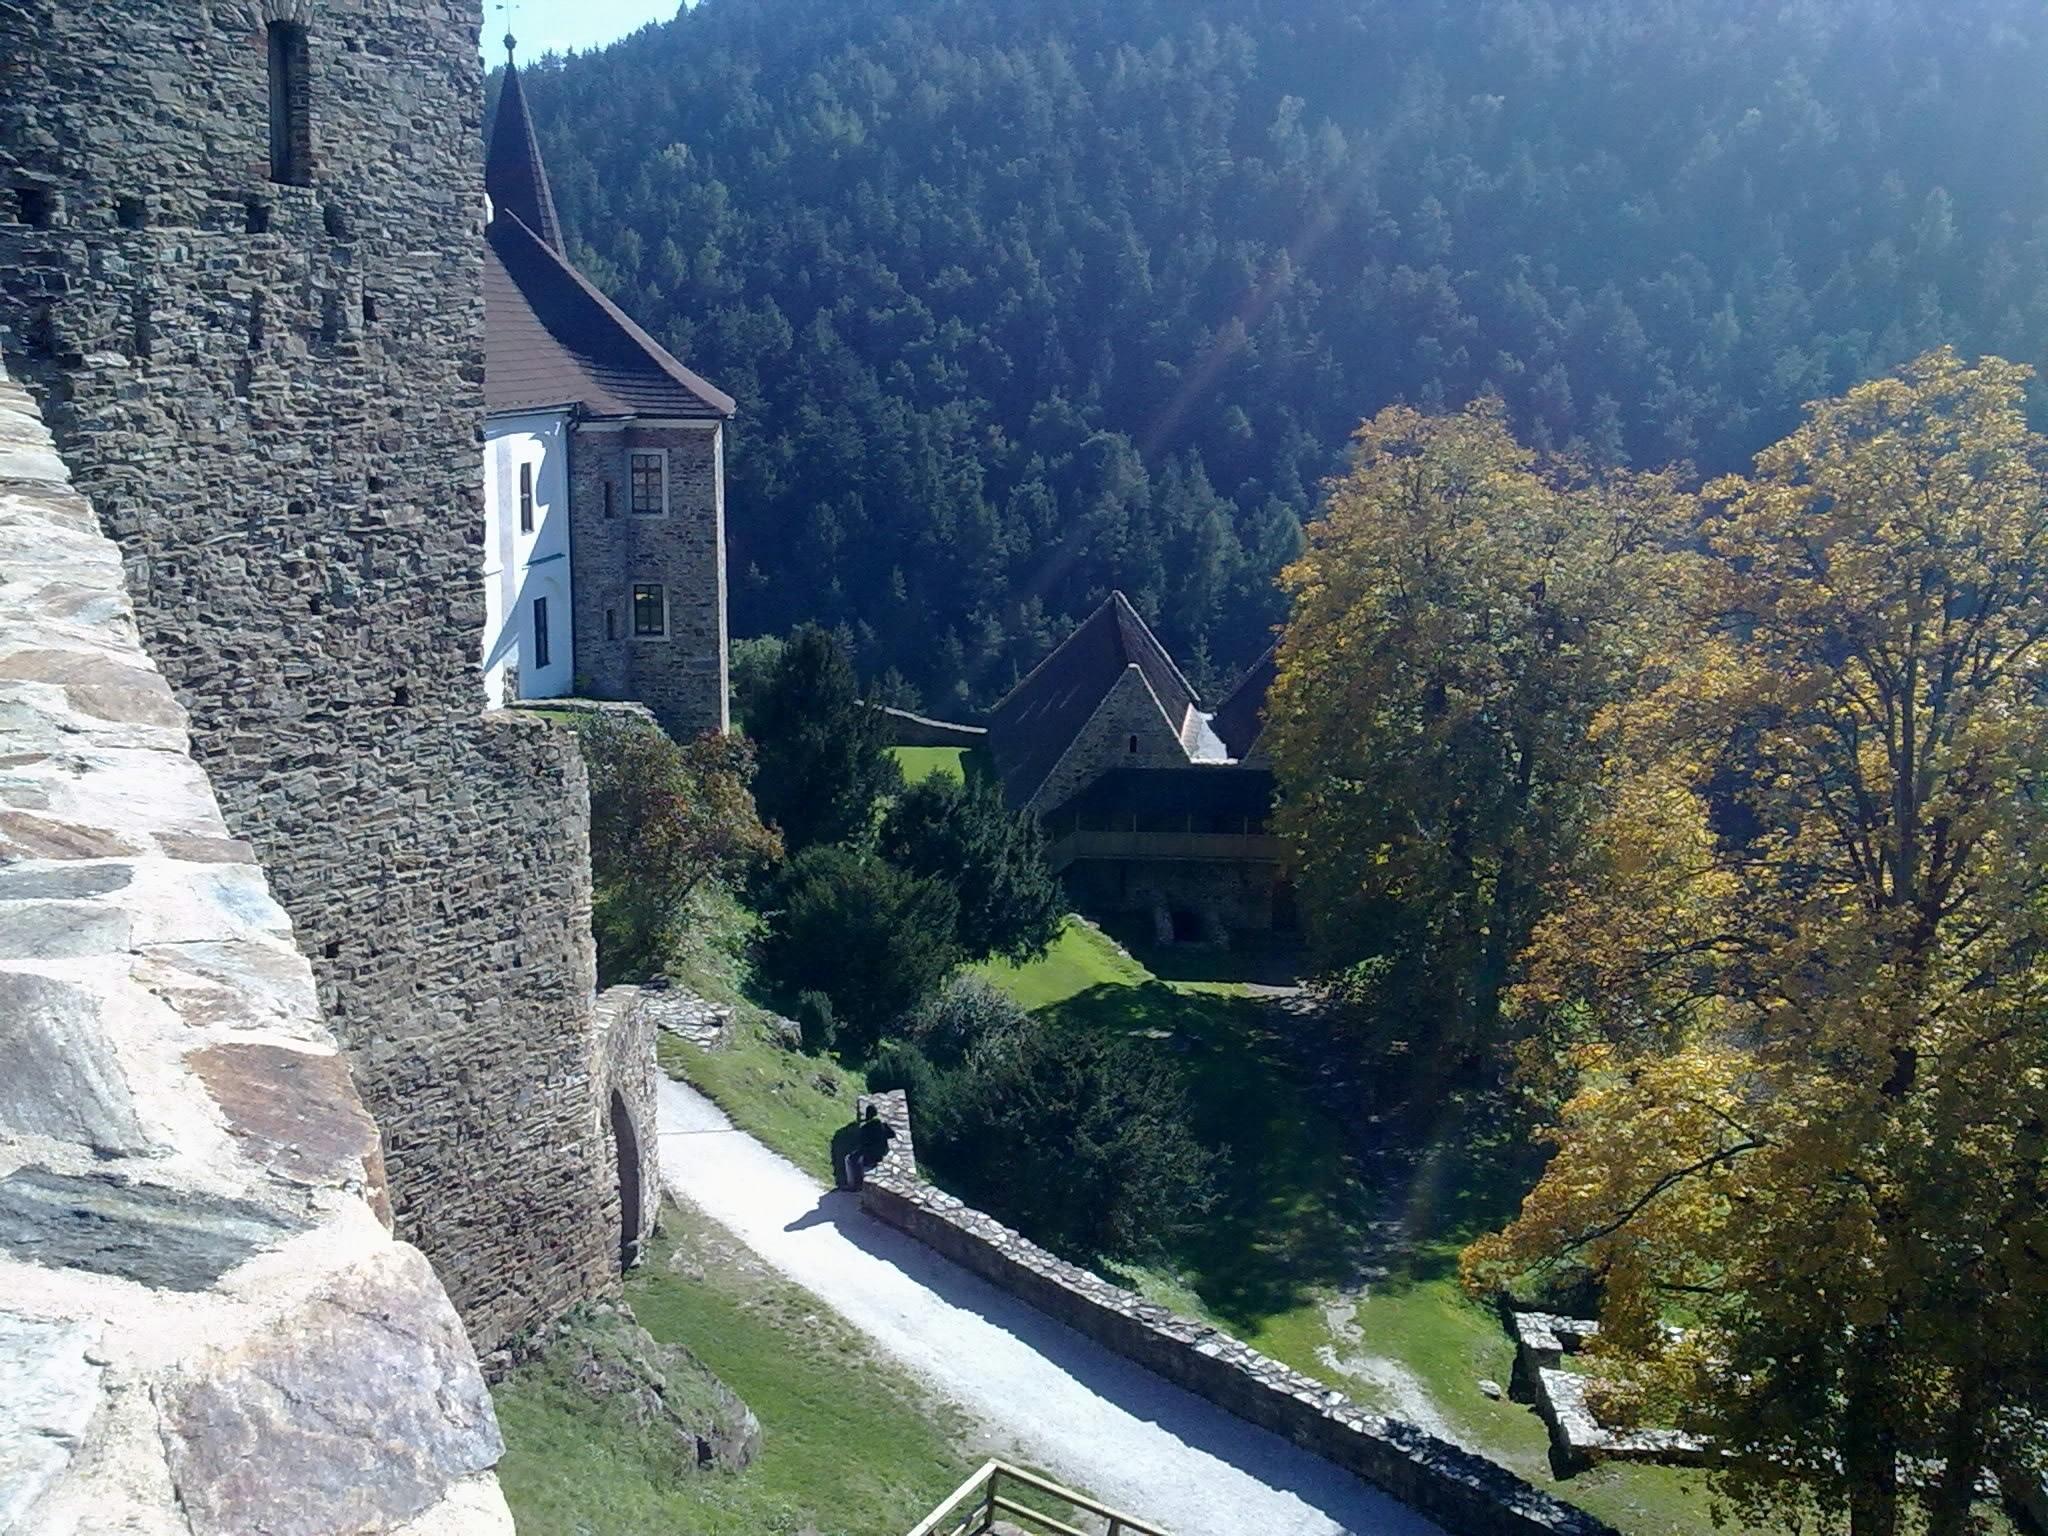 Velhartice, Pilsen Region, Tschechische Republik